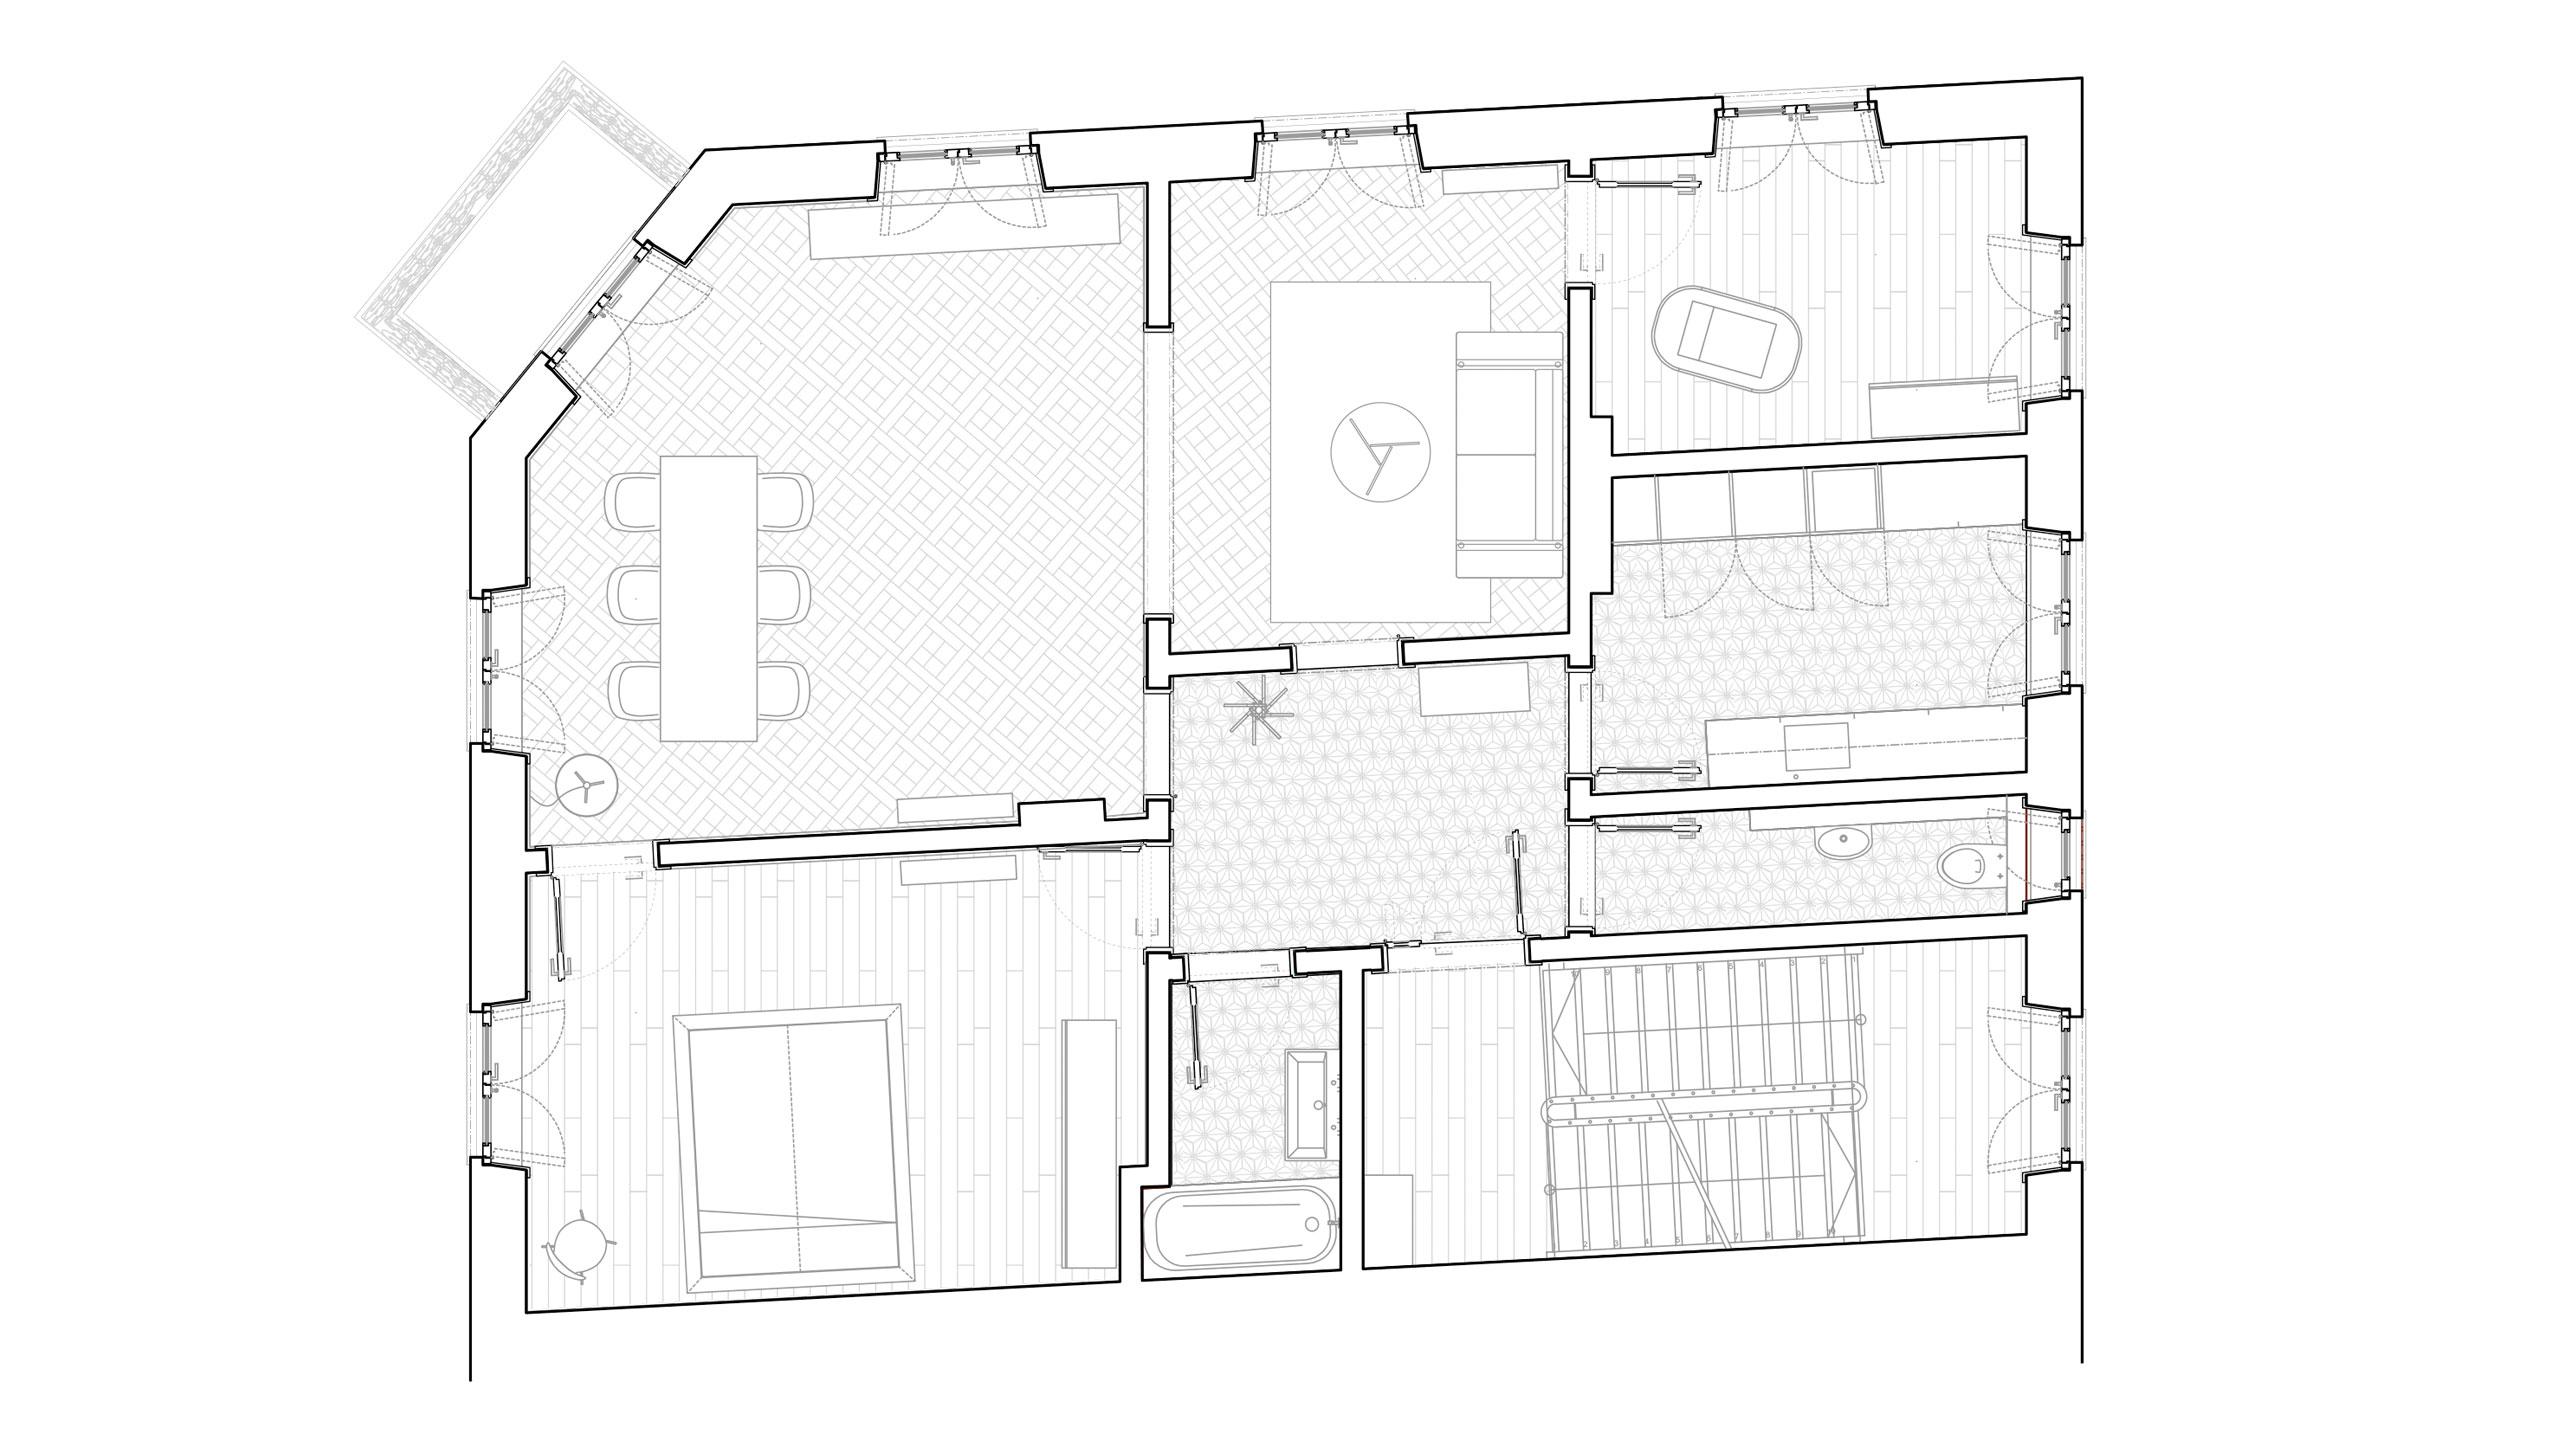 Projekte | Sort | Sonderegger Architekten | Page 2